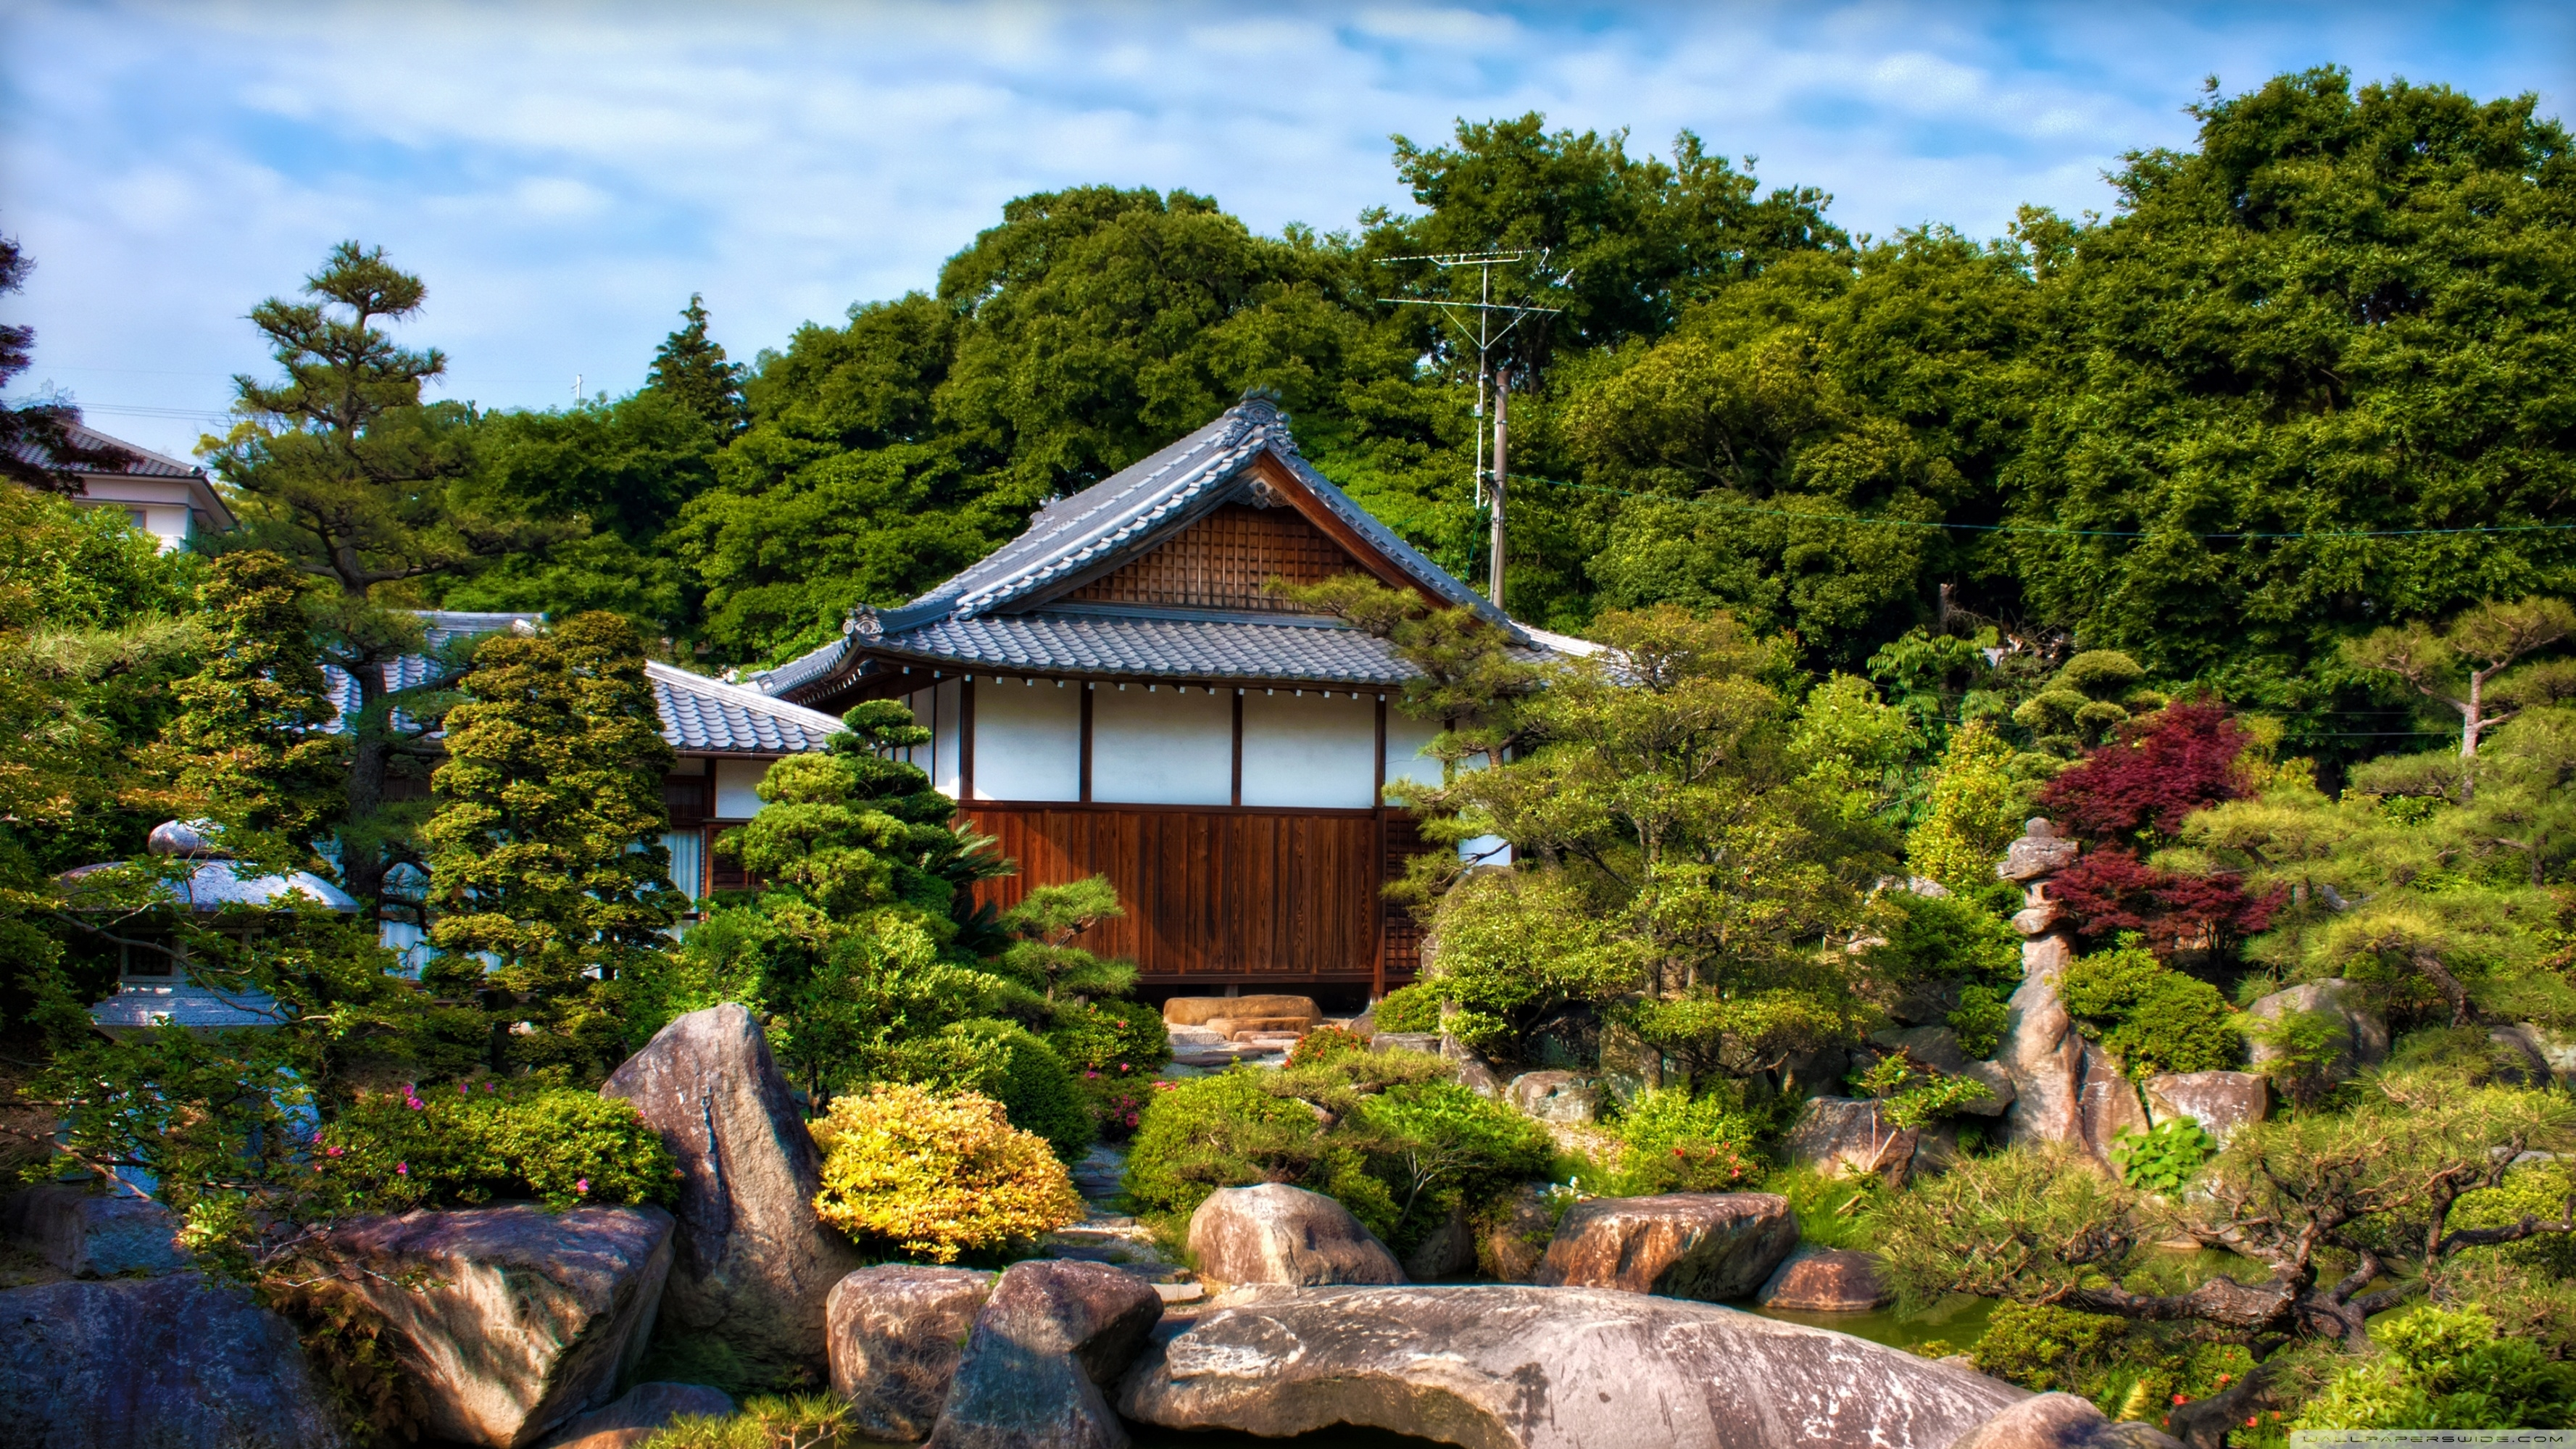 japanese garden ❤ 4k hd desktop wallpaper for 4k ultra hd tv